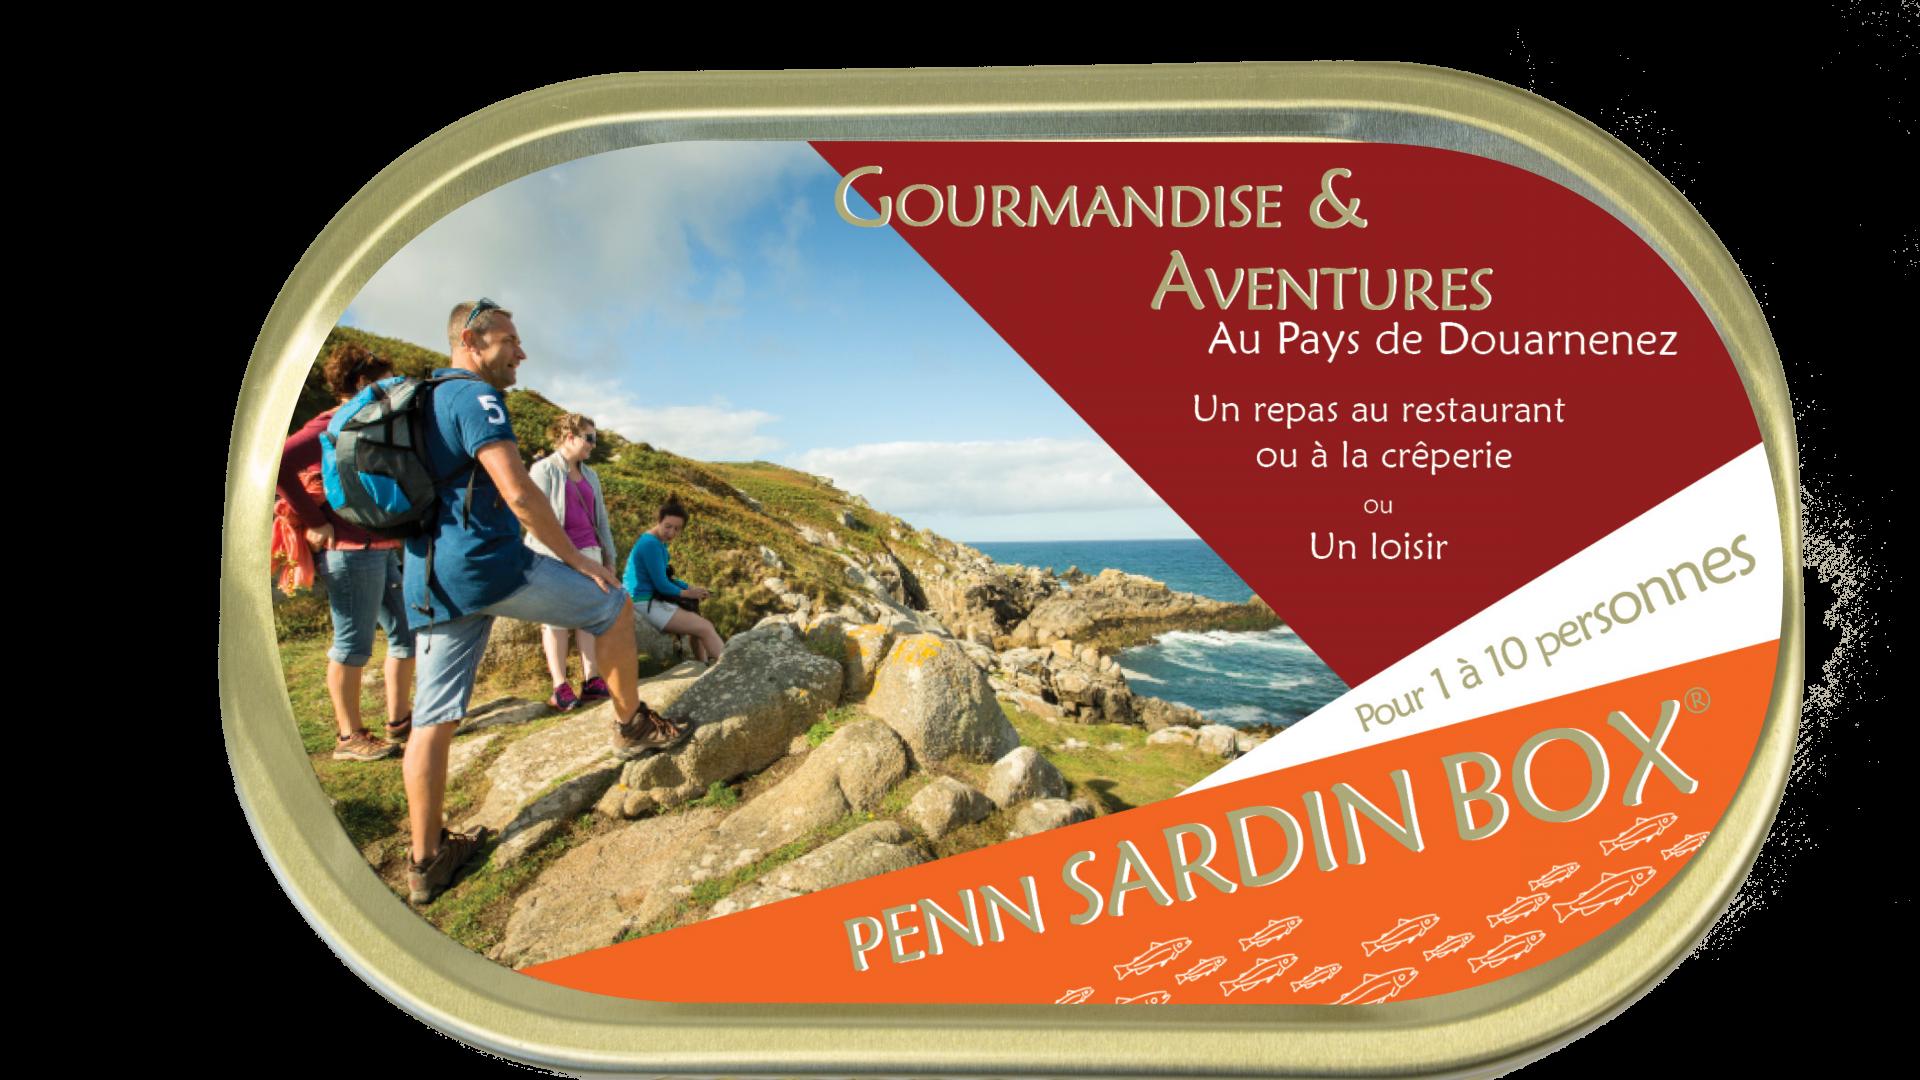 Penn Sardin Box Box Gourmandises Et Aventures